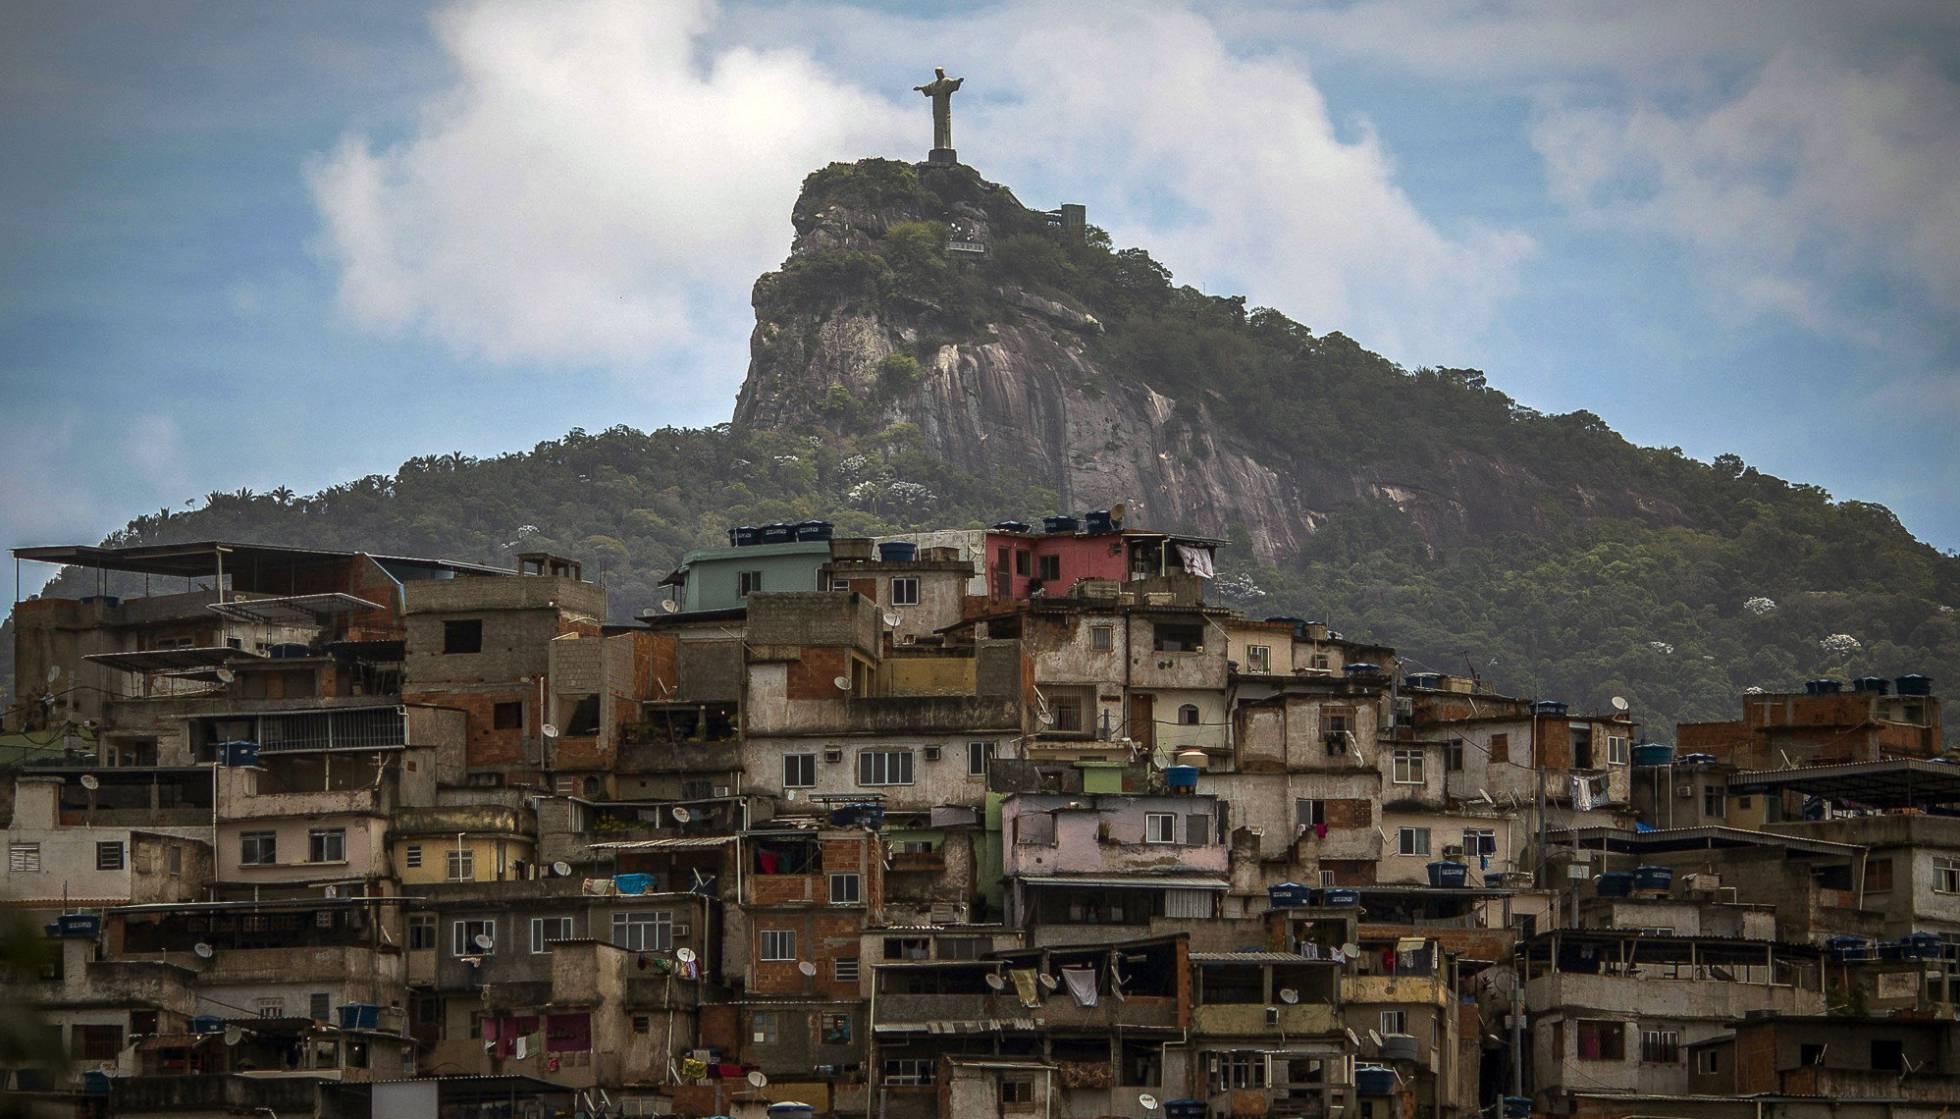 Vista do Cristo Redentor e da favela Morro da Coroa, no Rio. Foto: MAURO PIMENTEL AFP